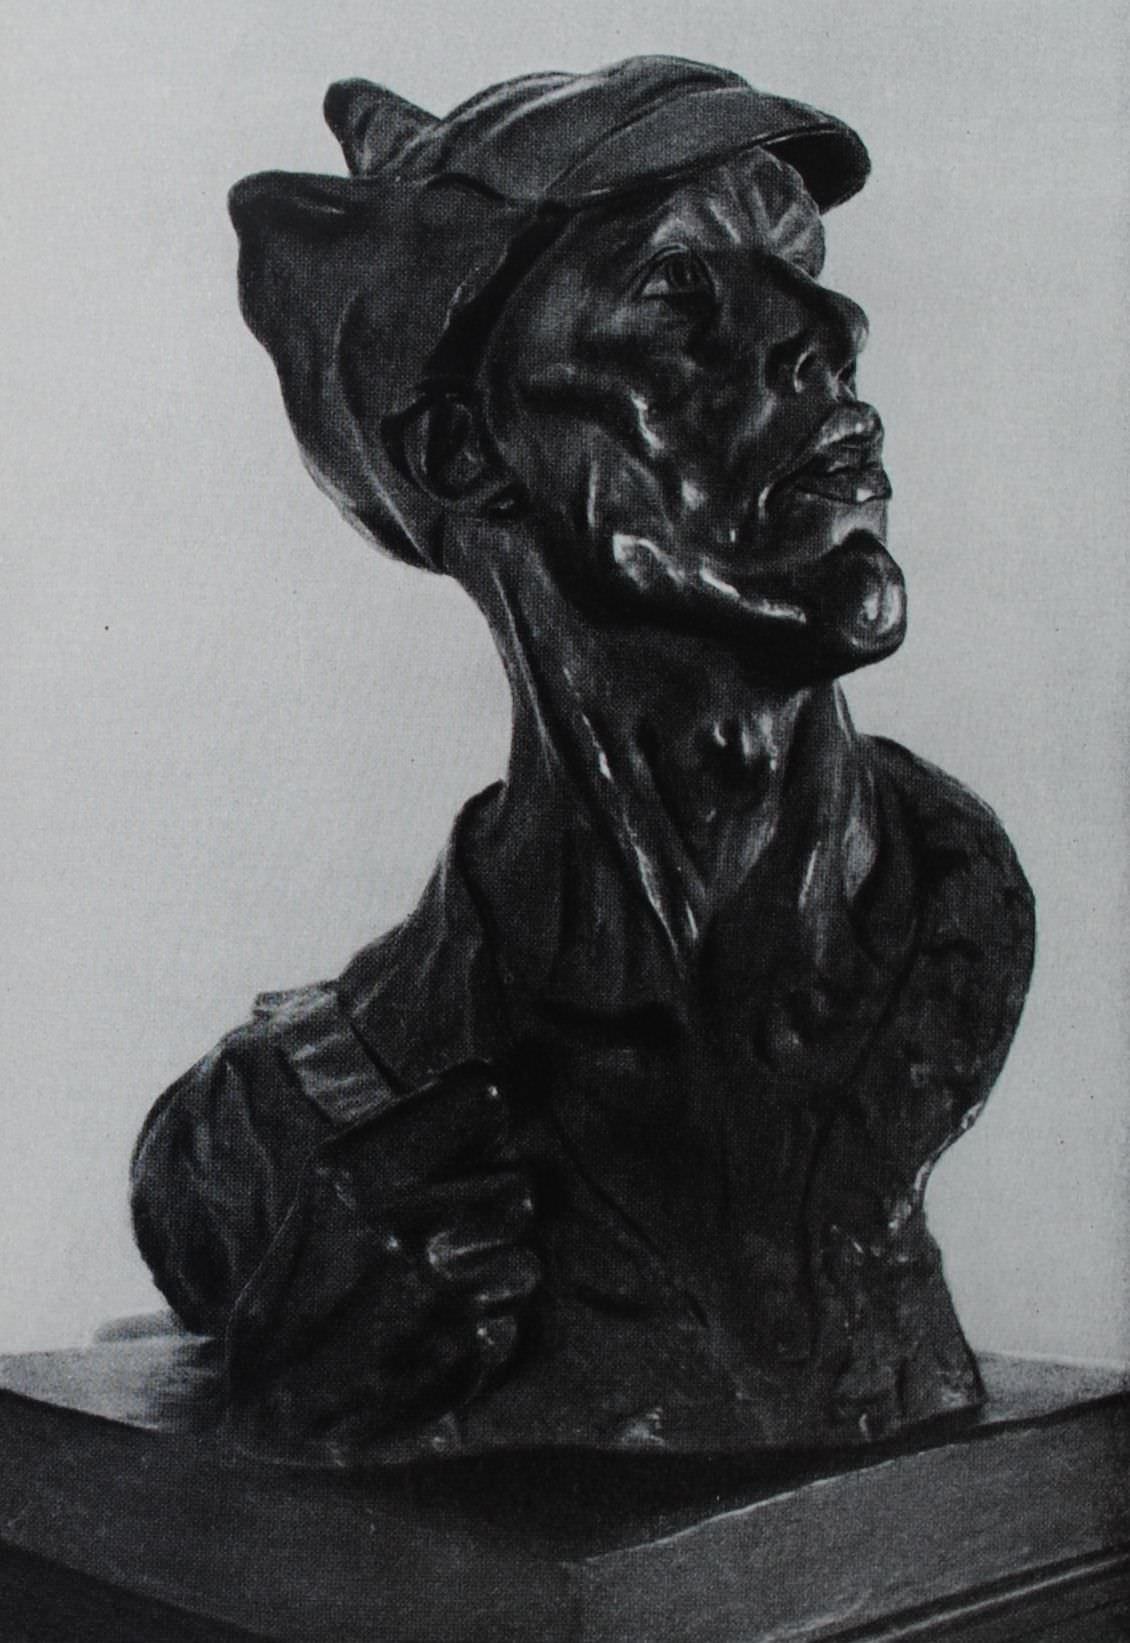 Красноармеец. И.Д. Шадр. Бронза. 1920 год.